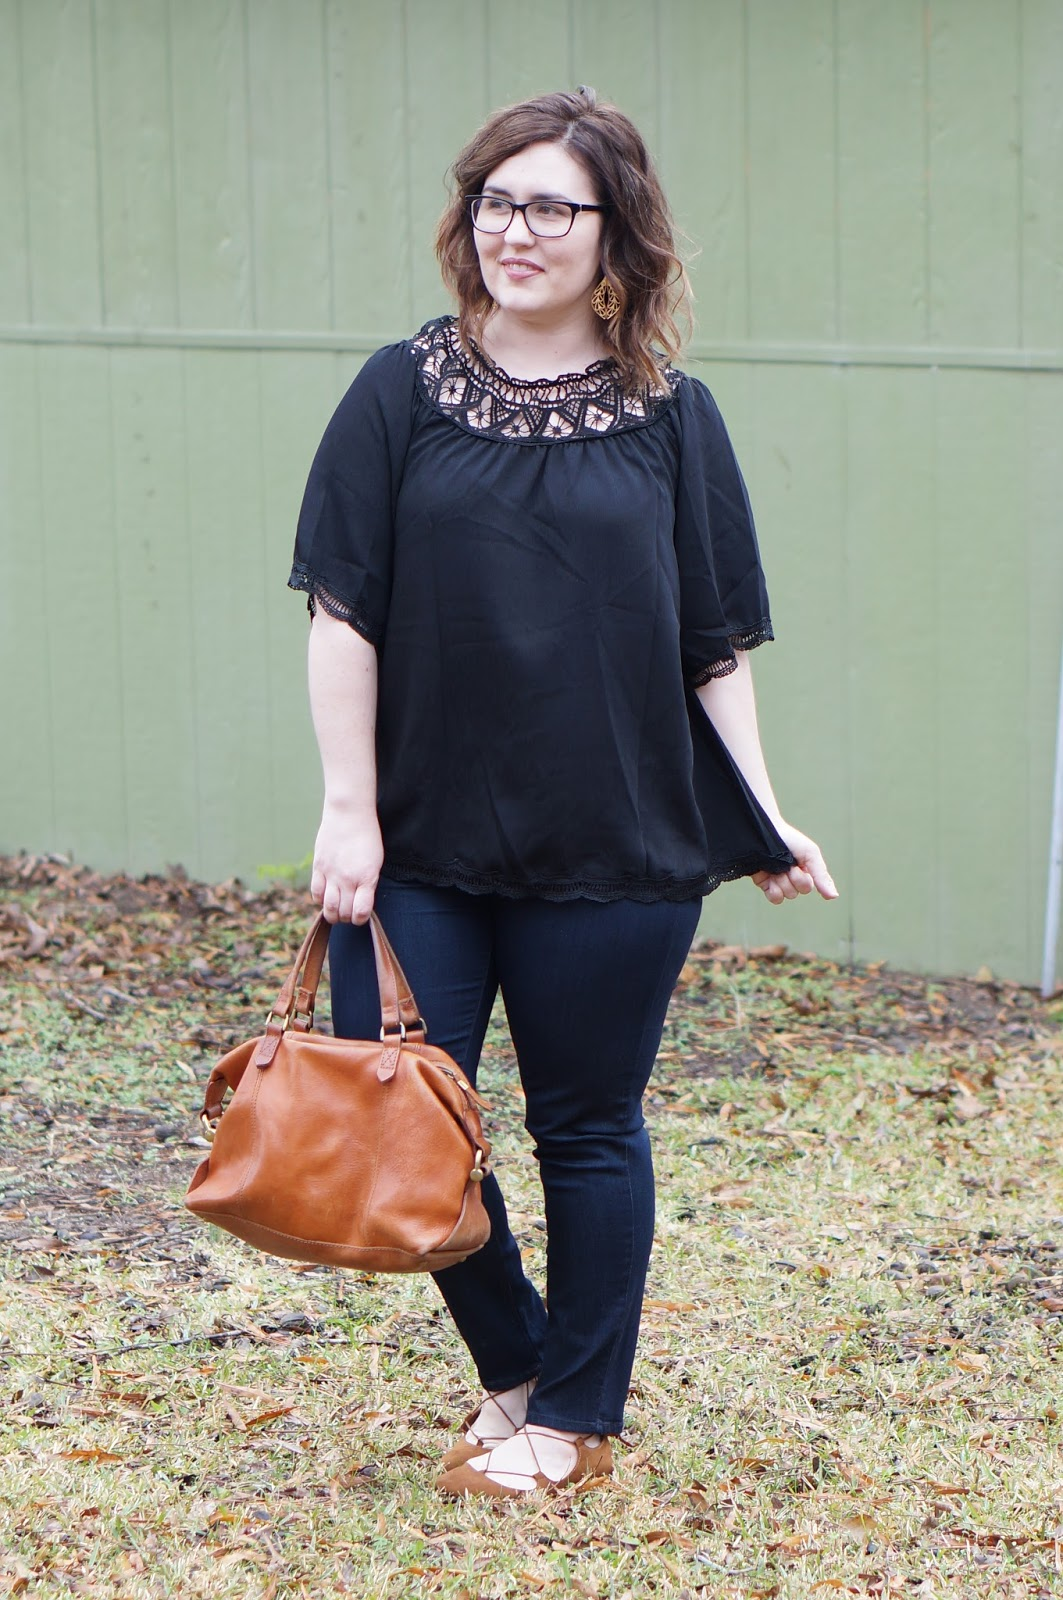 Rebecca Lately Zaful Off The Shoulder Black Top Just Black Ankle Jeans Stitch Fix Target Kady Flats Madewell Kensington Satchel